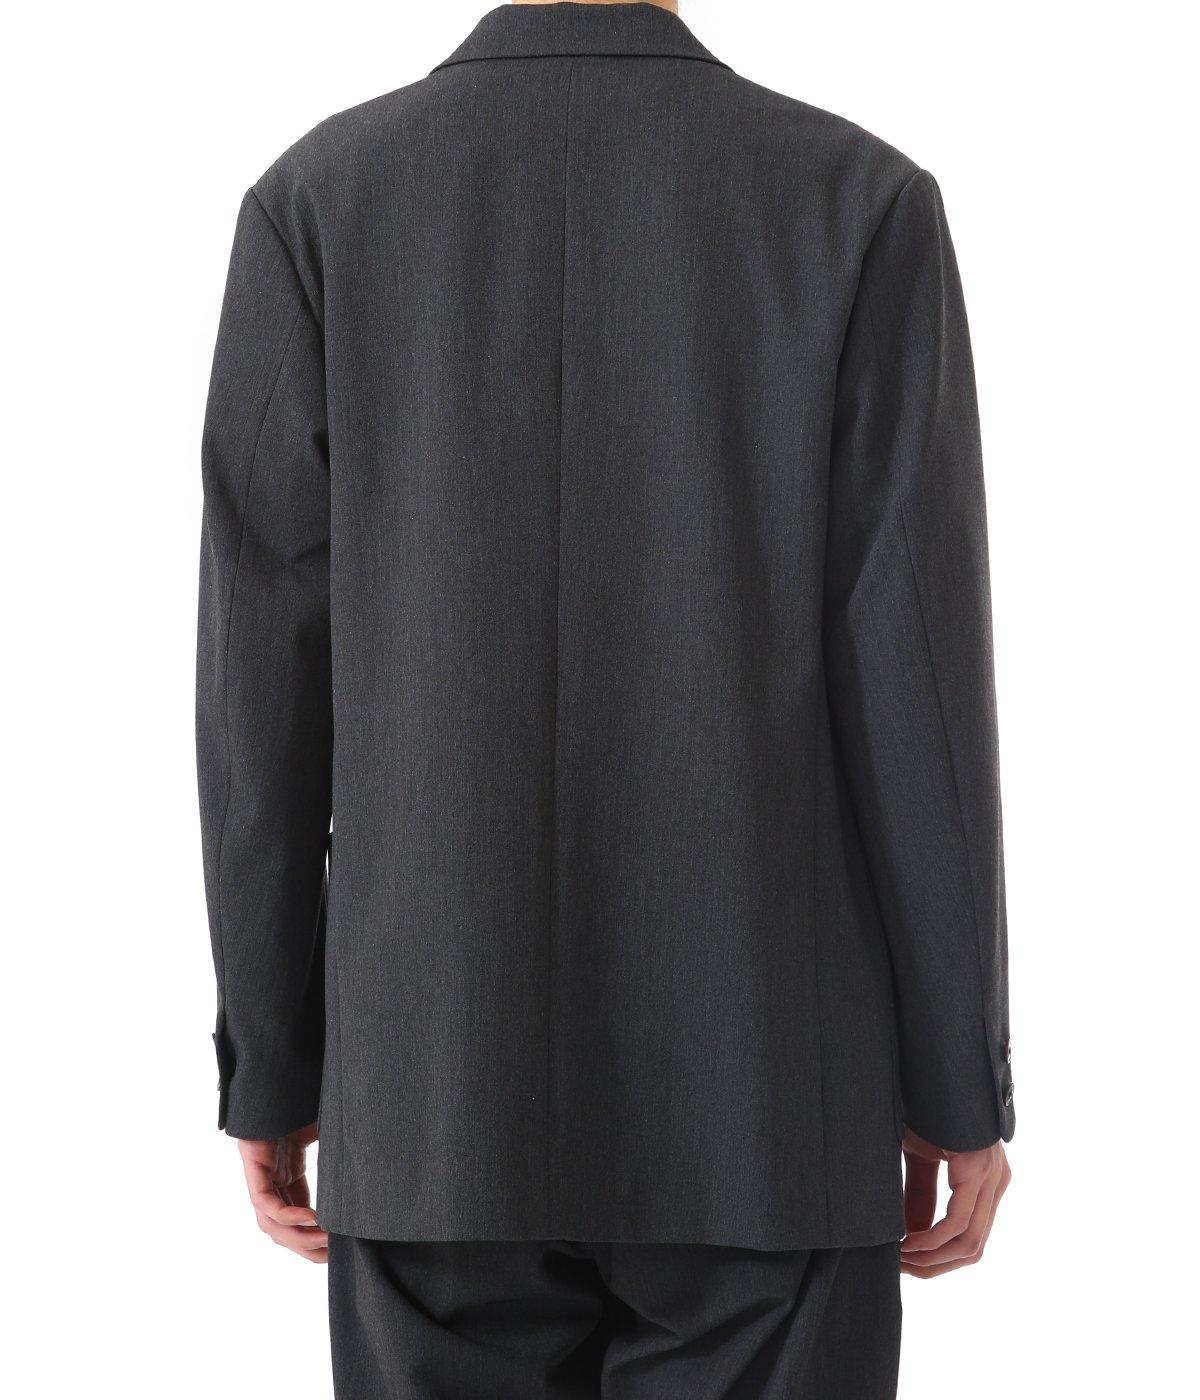 2WAY 2Bジャケット